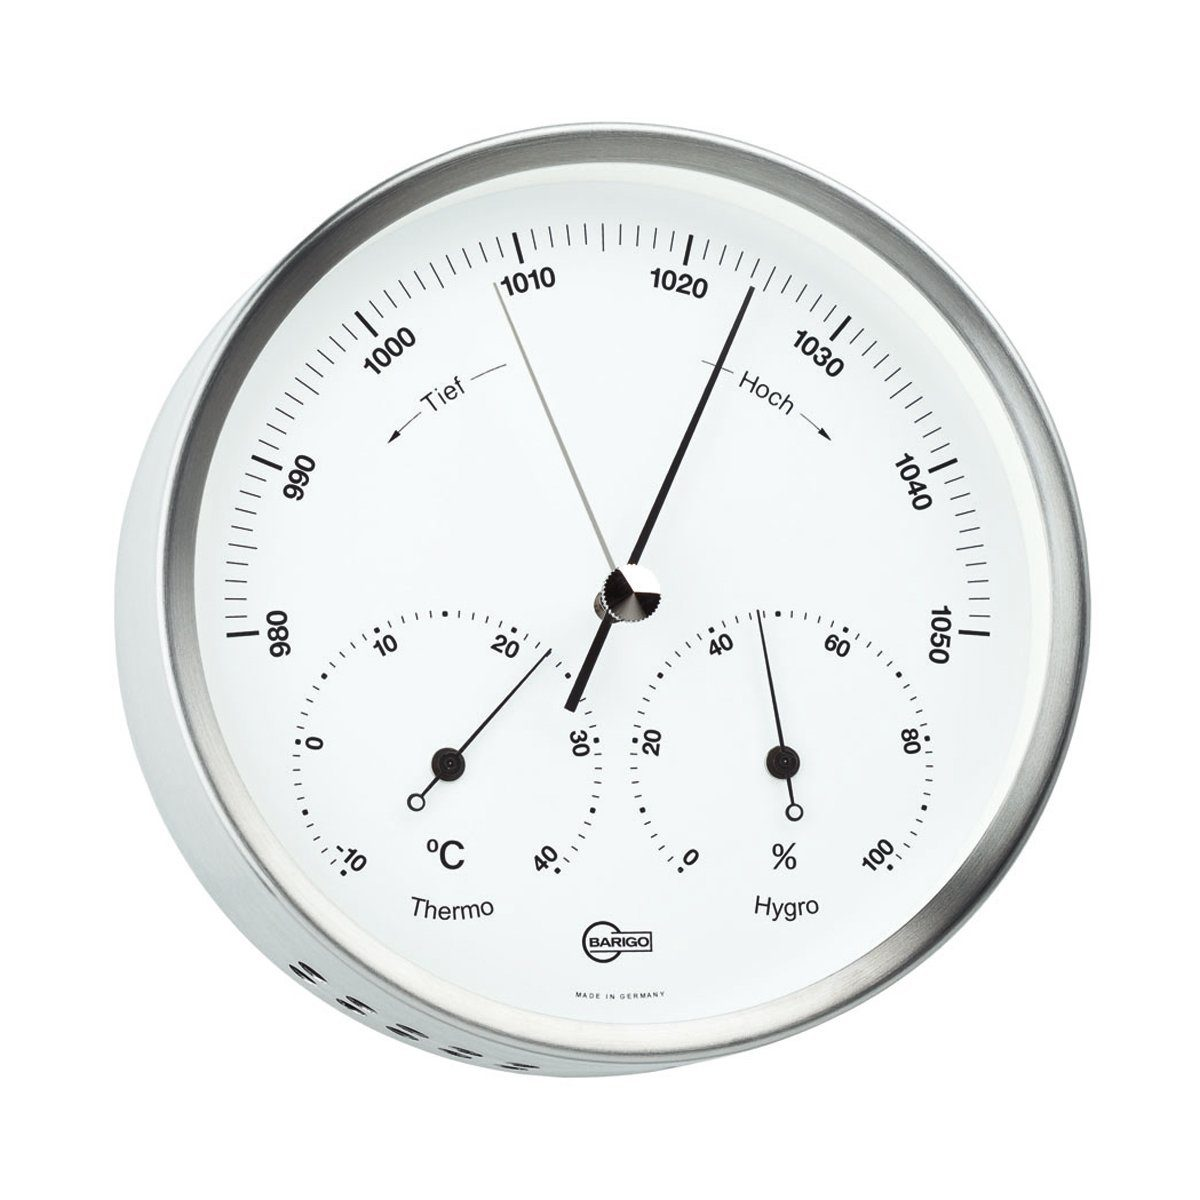 BARIGO Barigo Wetterstation Baro- Thermo- Hygrometer 13cm